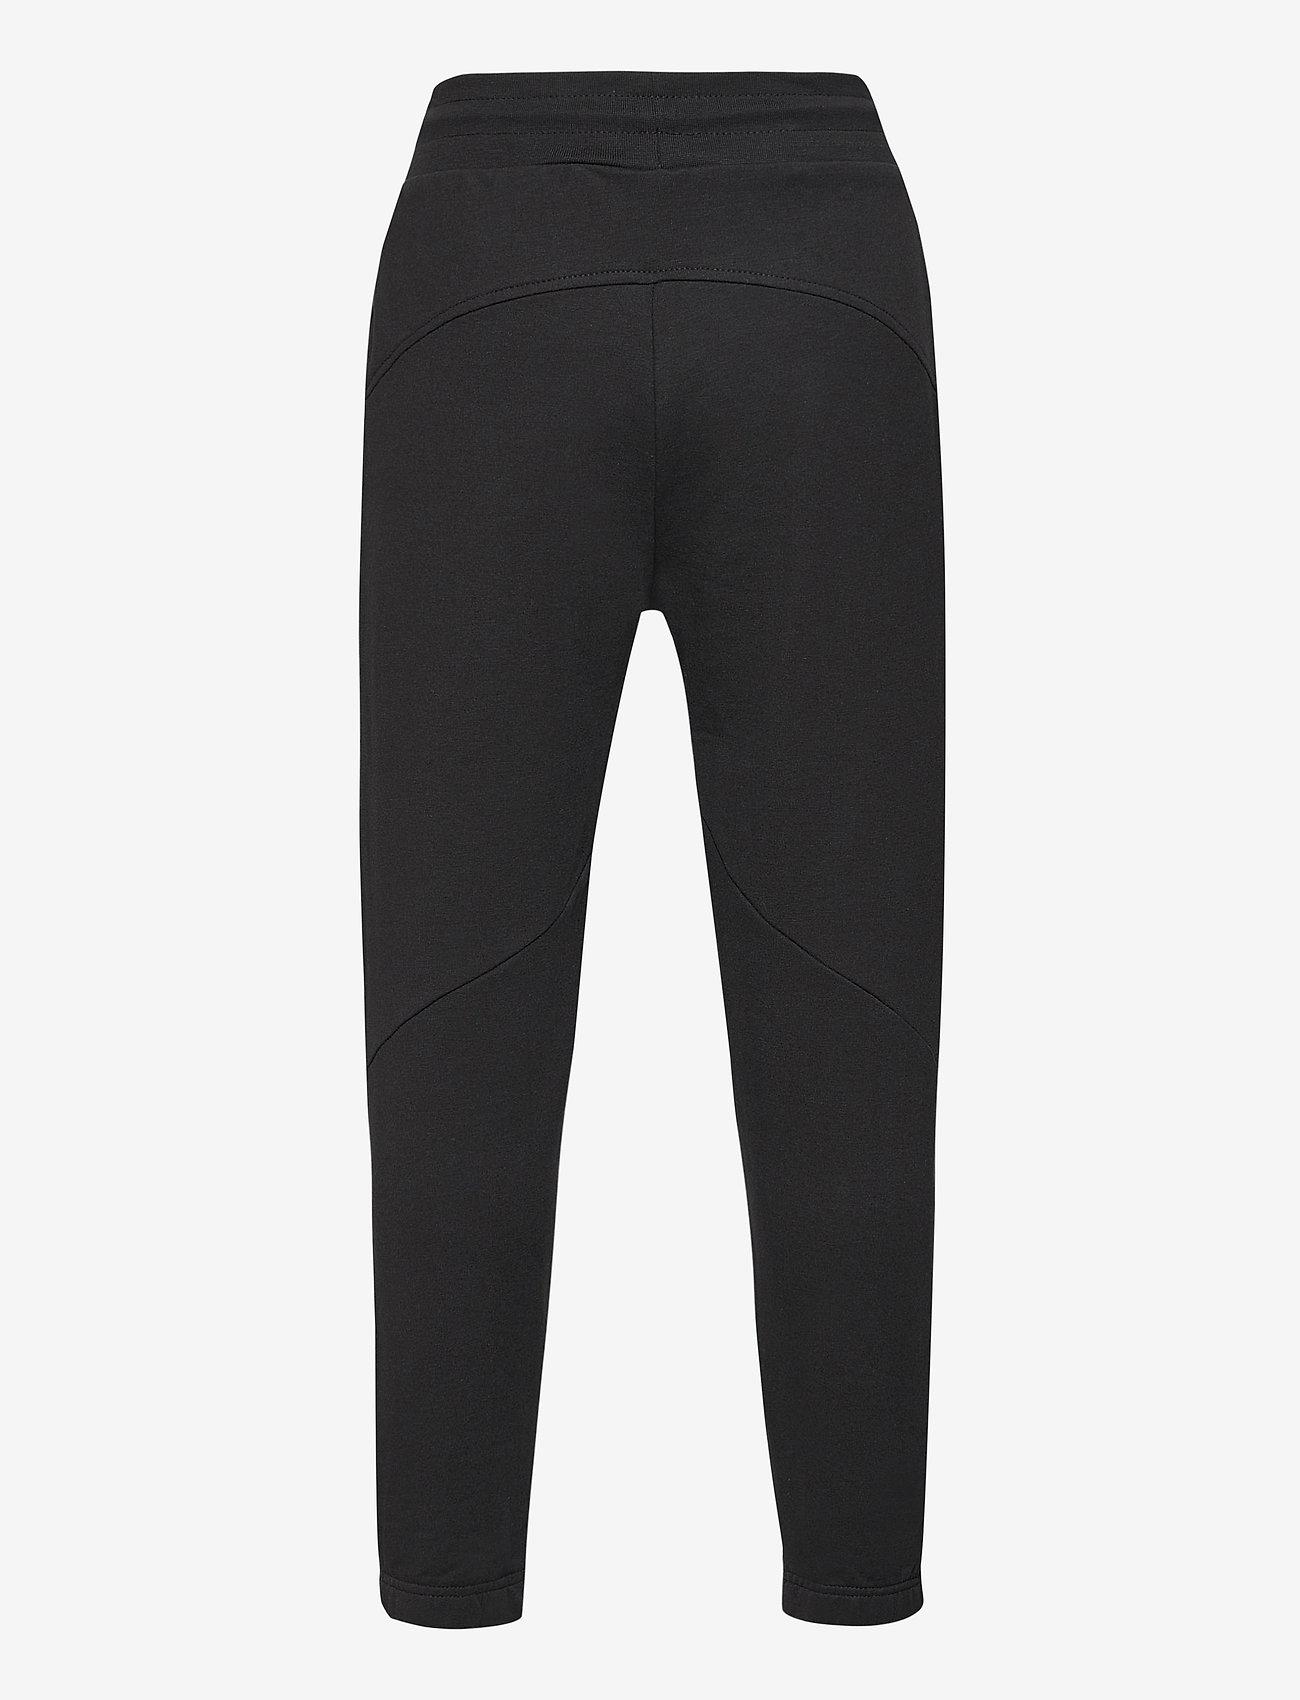 Hummel - hmlNUEVE PANTS - sweatpants - black - 1